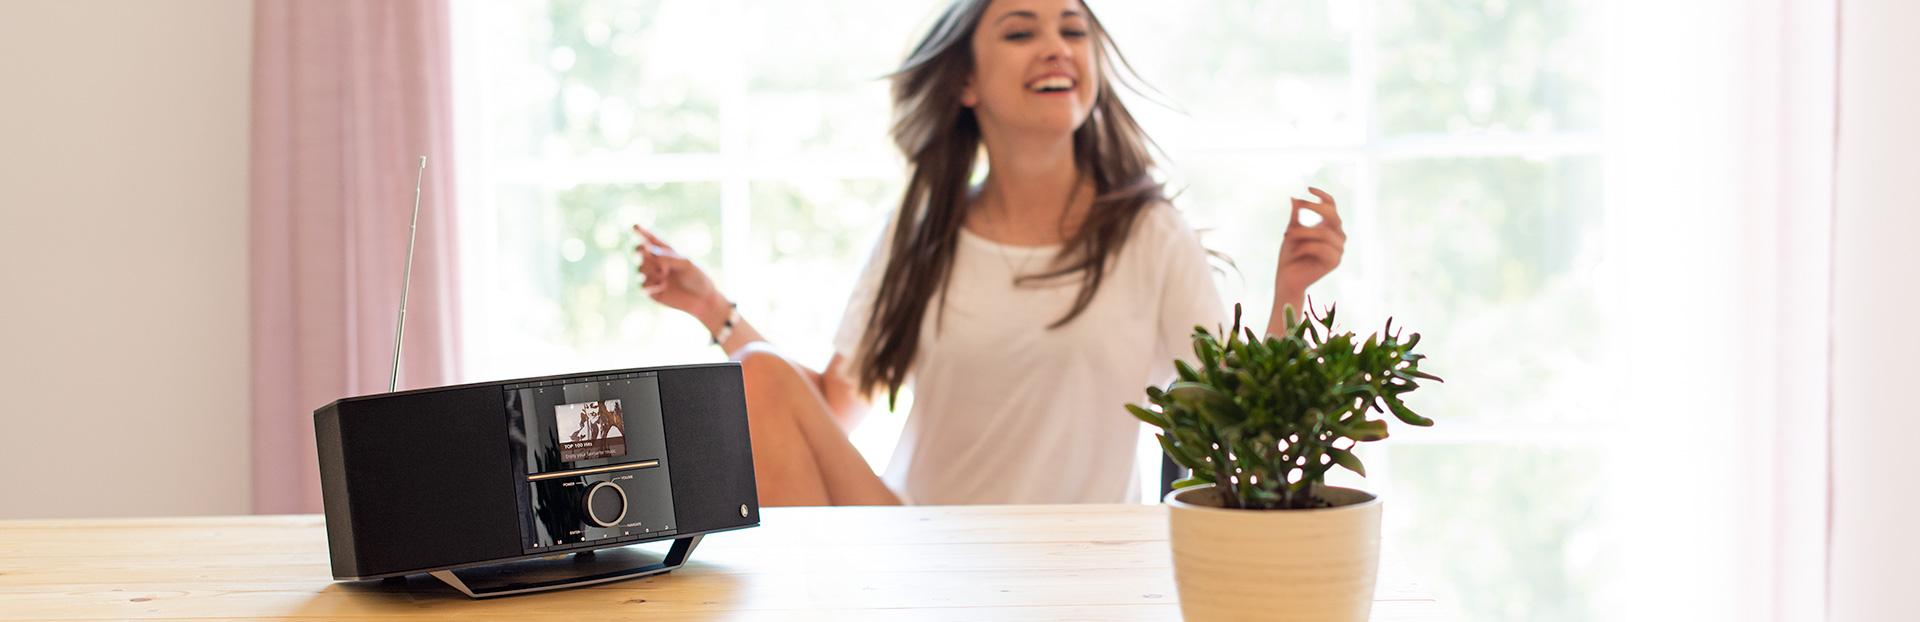 hama ist preis leistungs sieger hama de. Black Bedroom Furniture Sets. Home Design Ideas